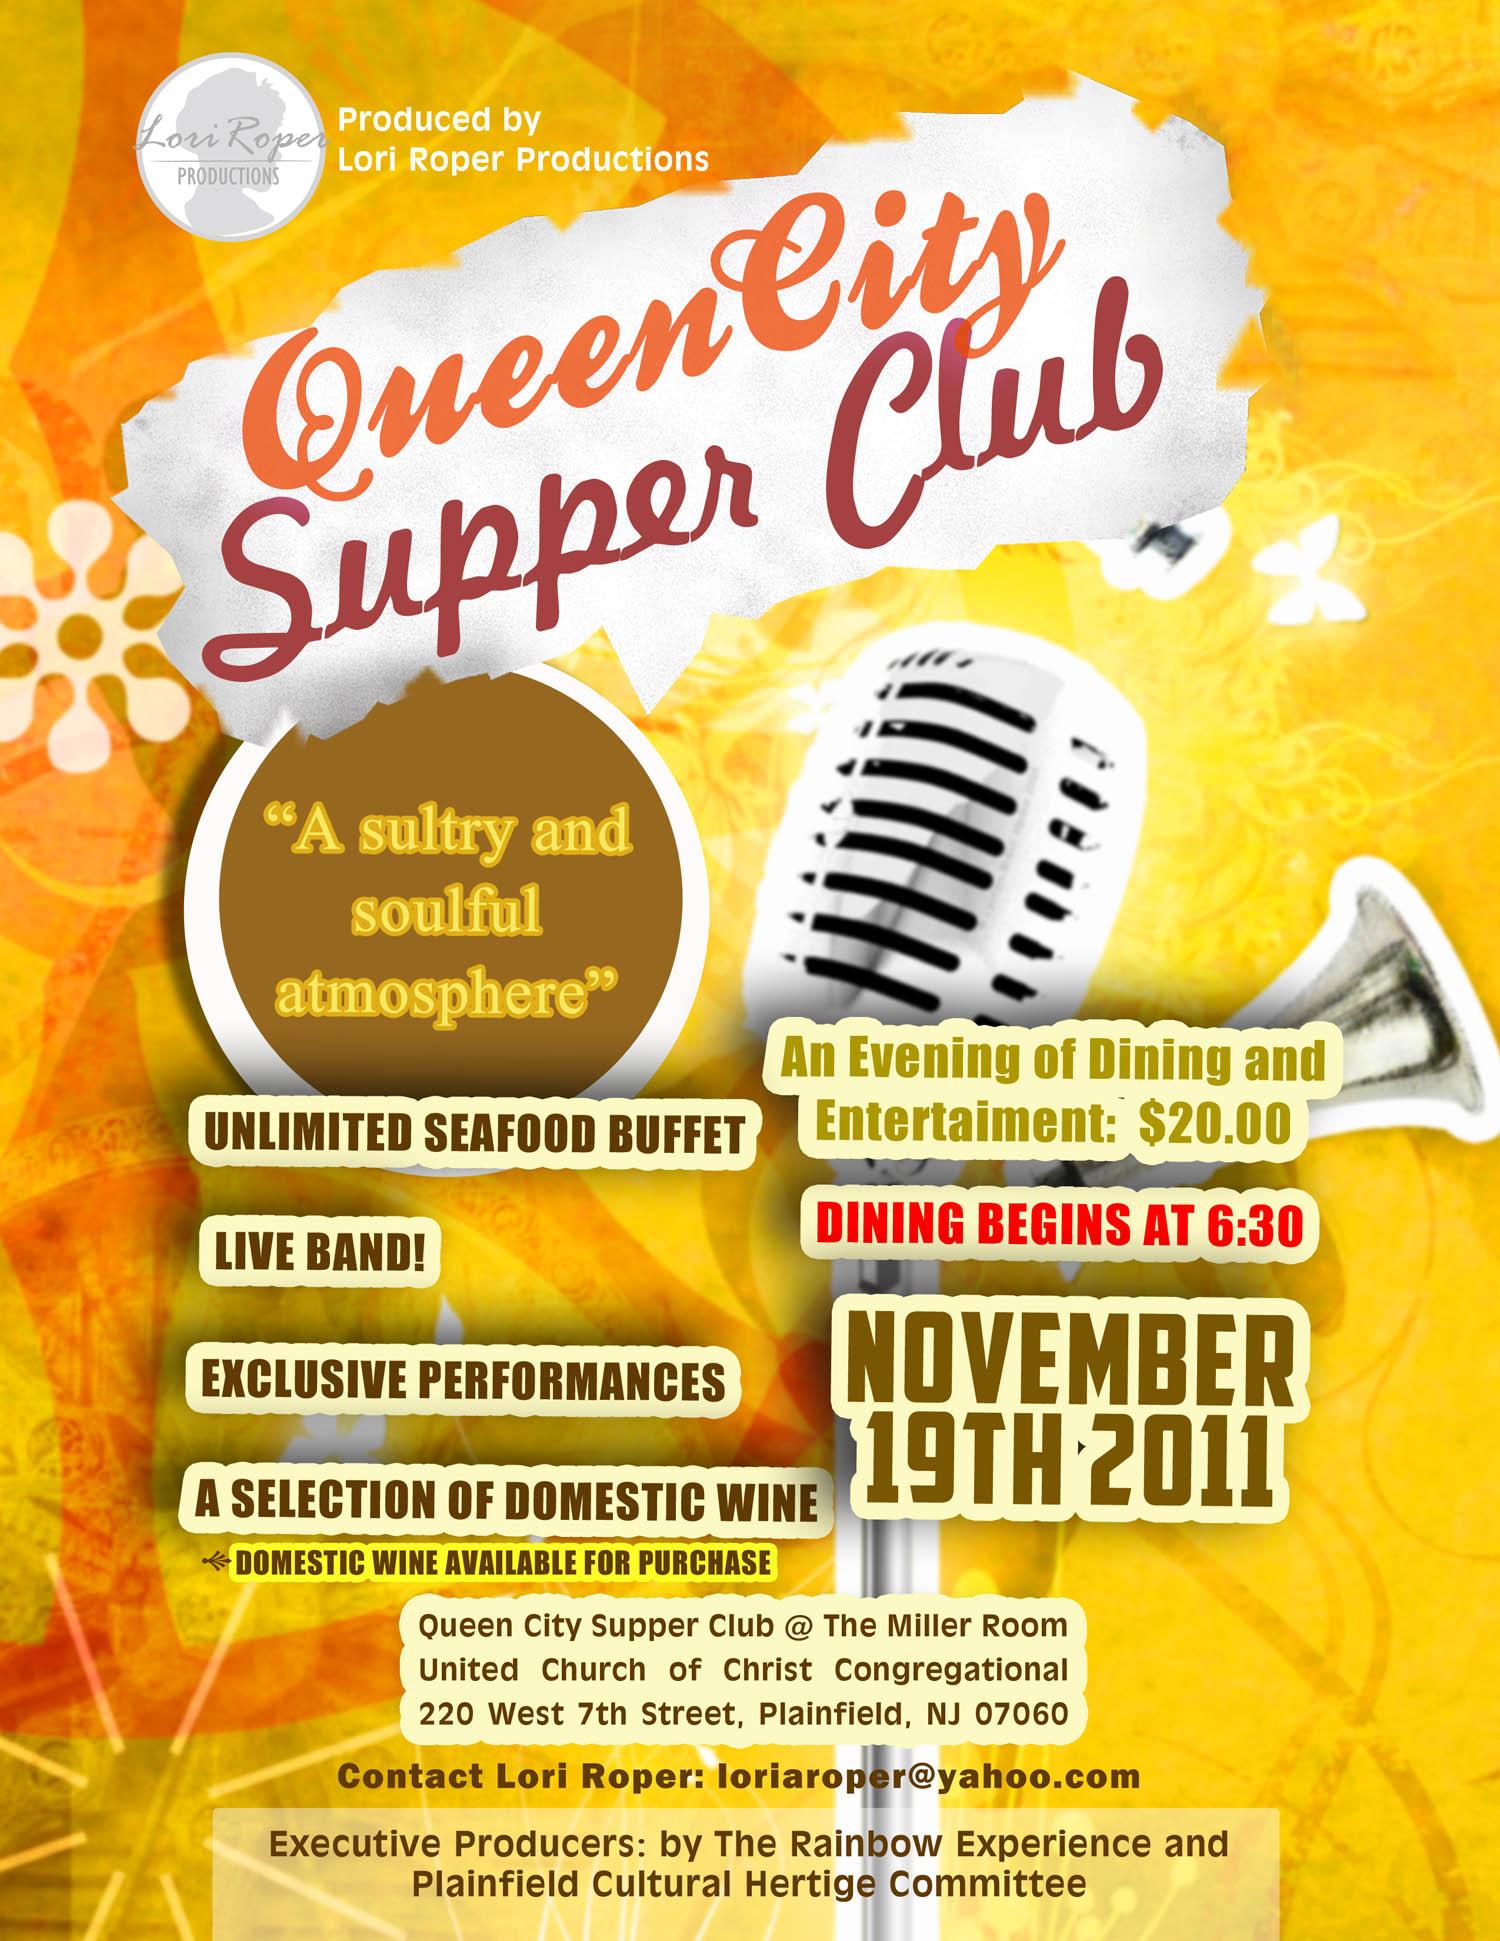 Queen City Supper Club Flyer.jpg